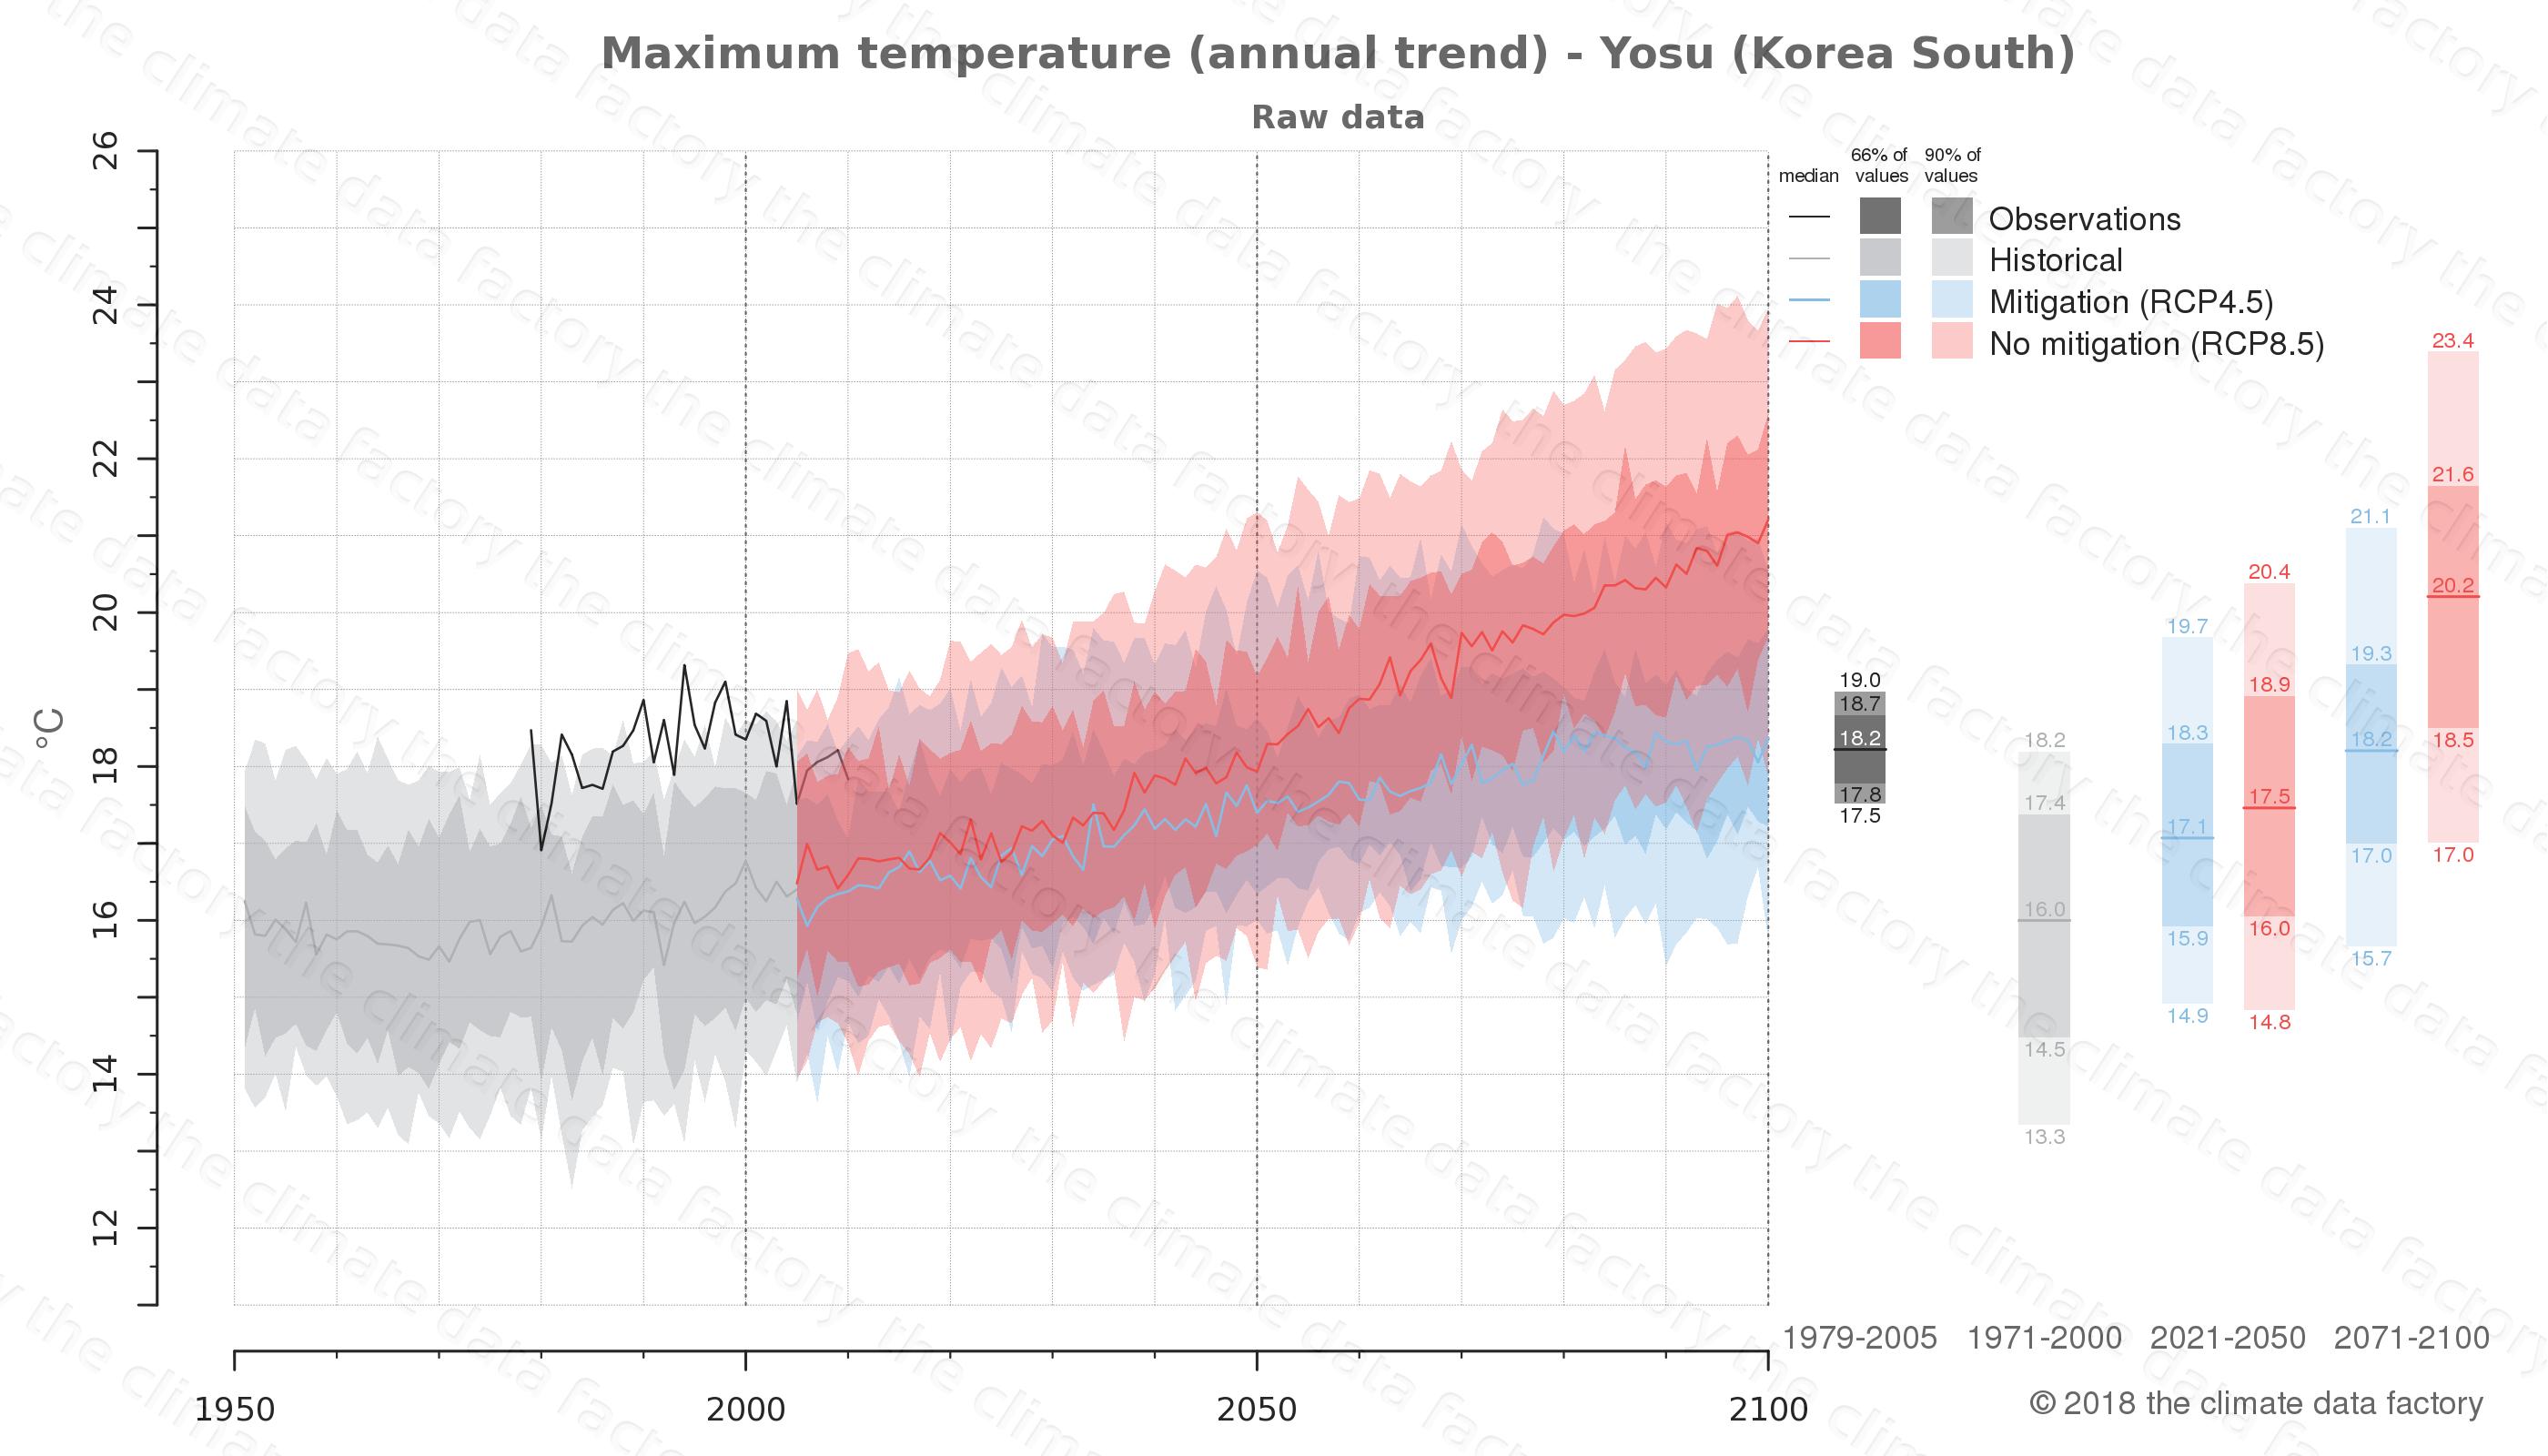 climate change data policy adaptation climate graph city data maximum-temperature yosu south korea